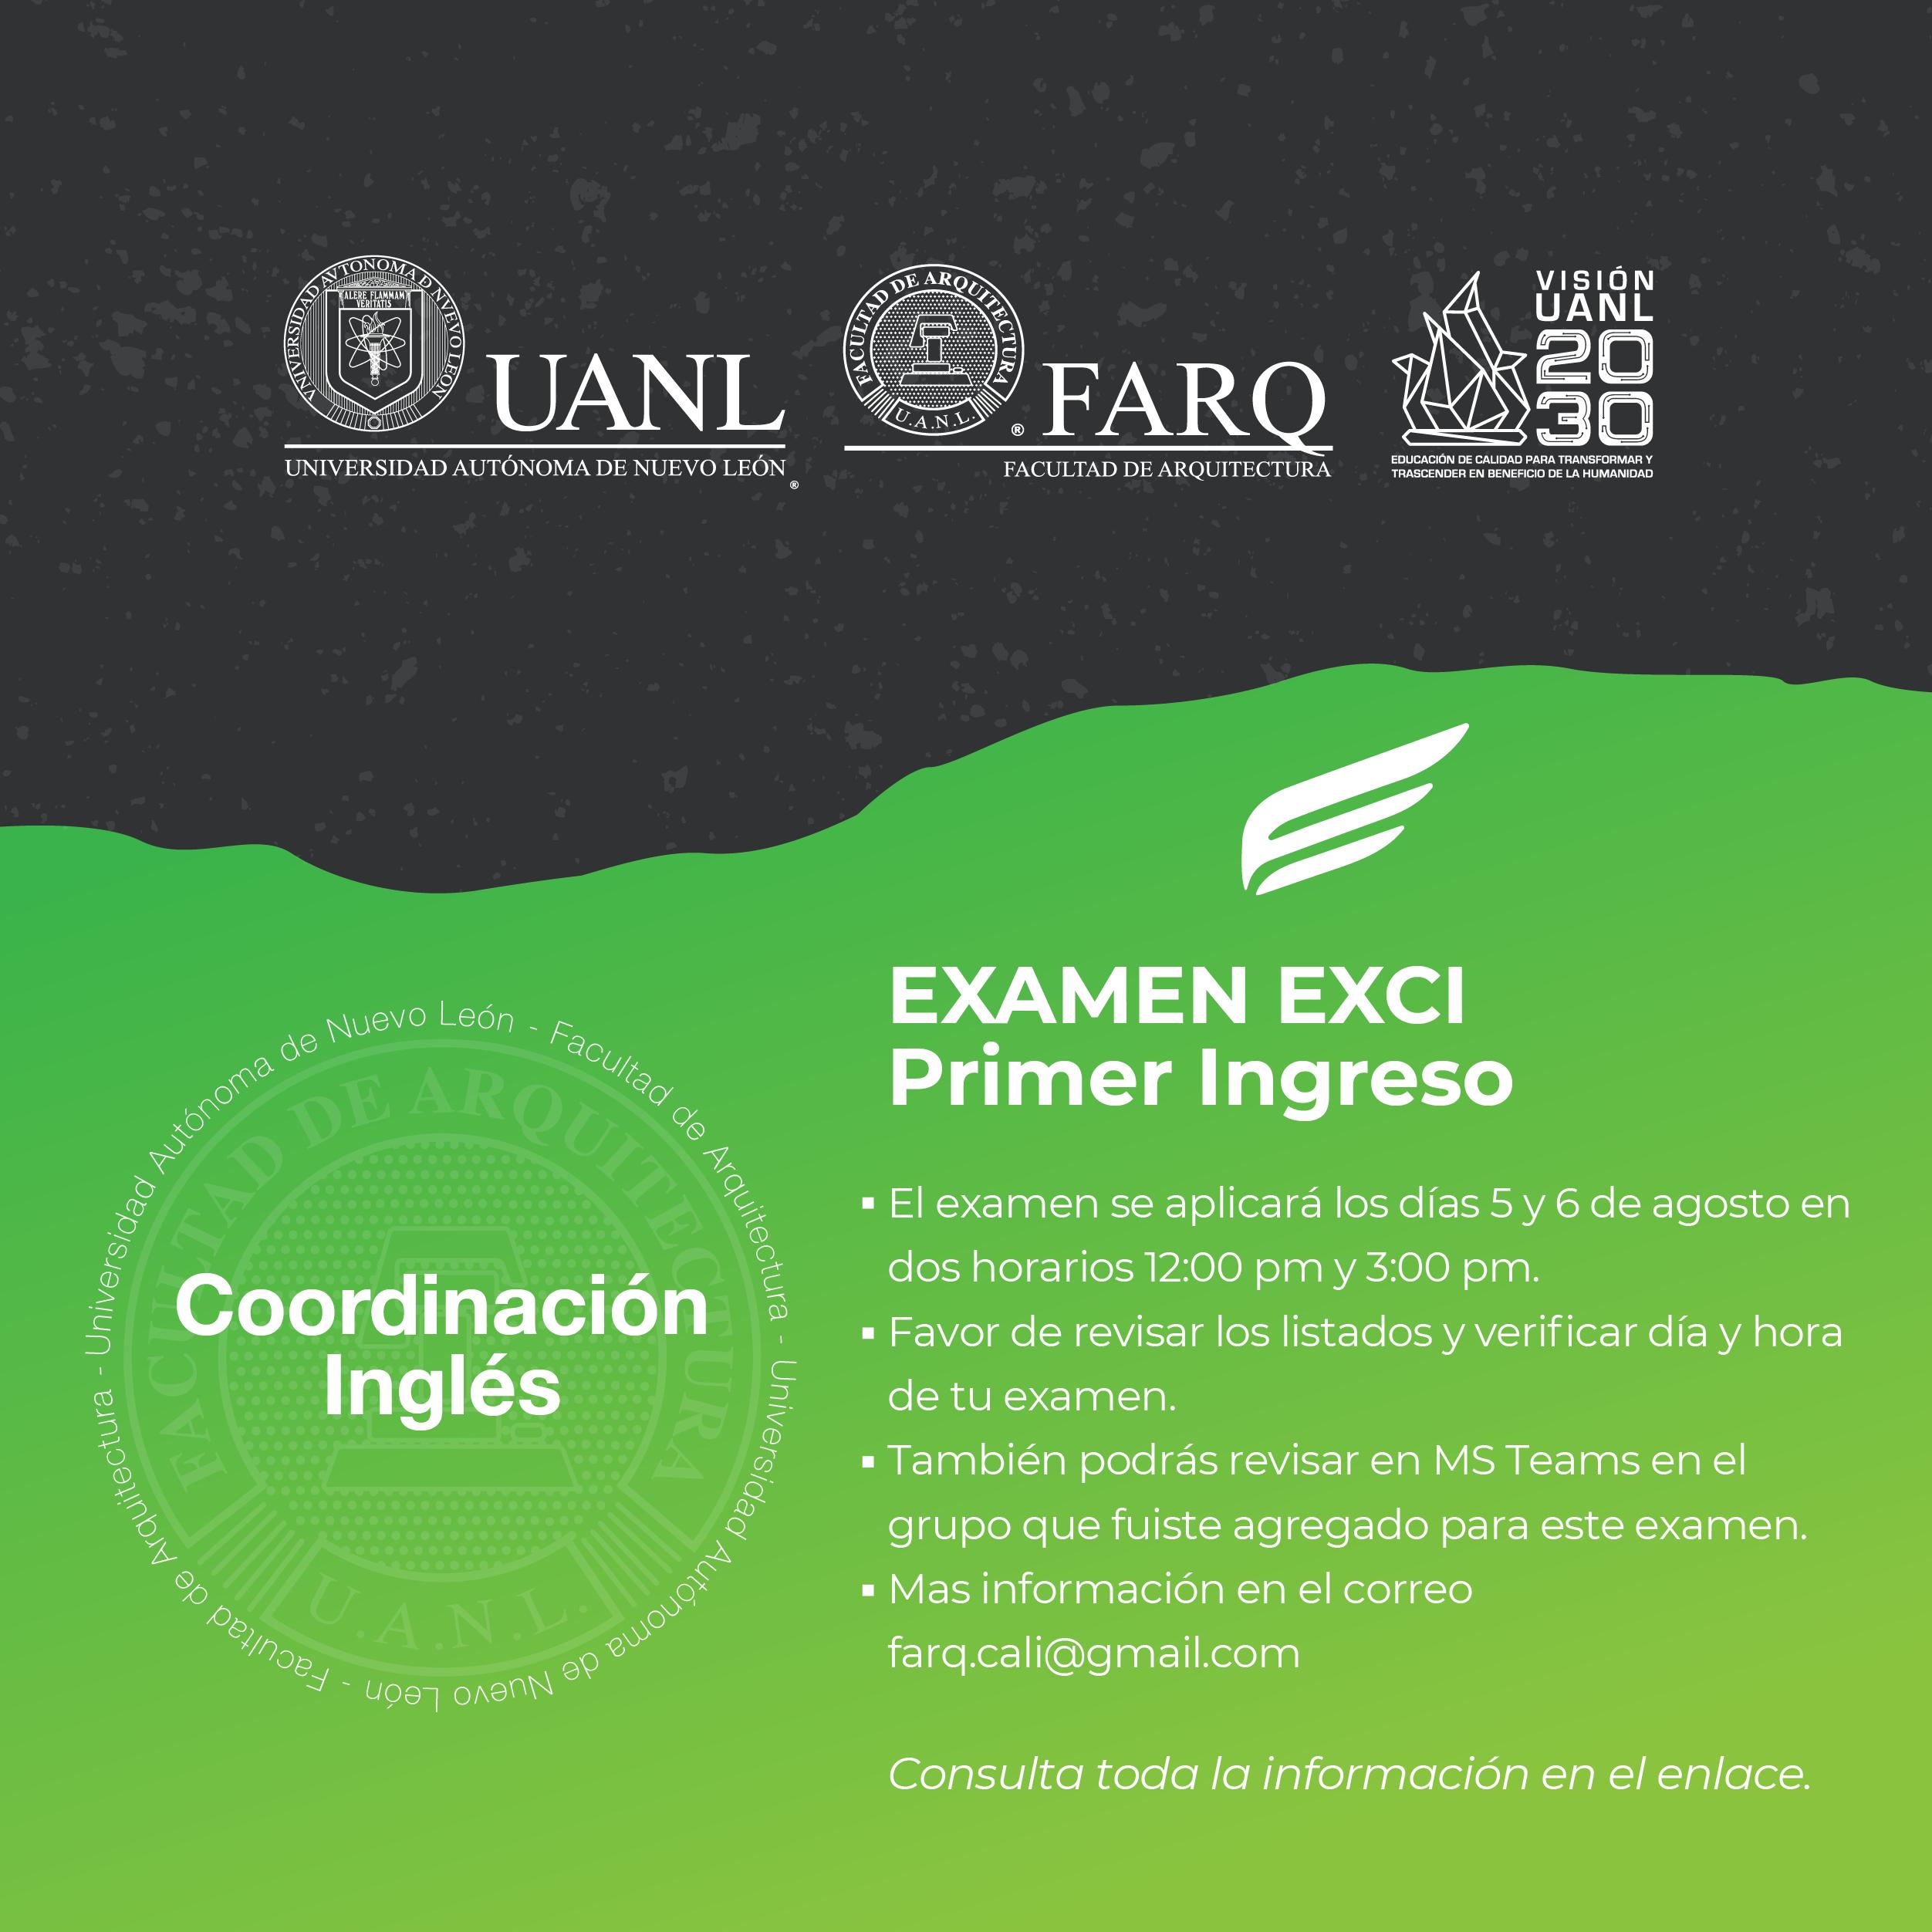 Examen EXCI – Primero ingreso